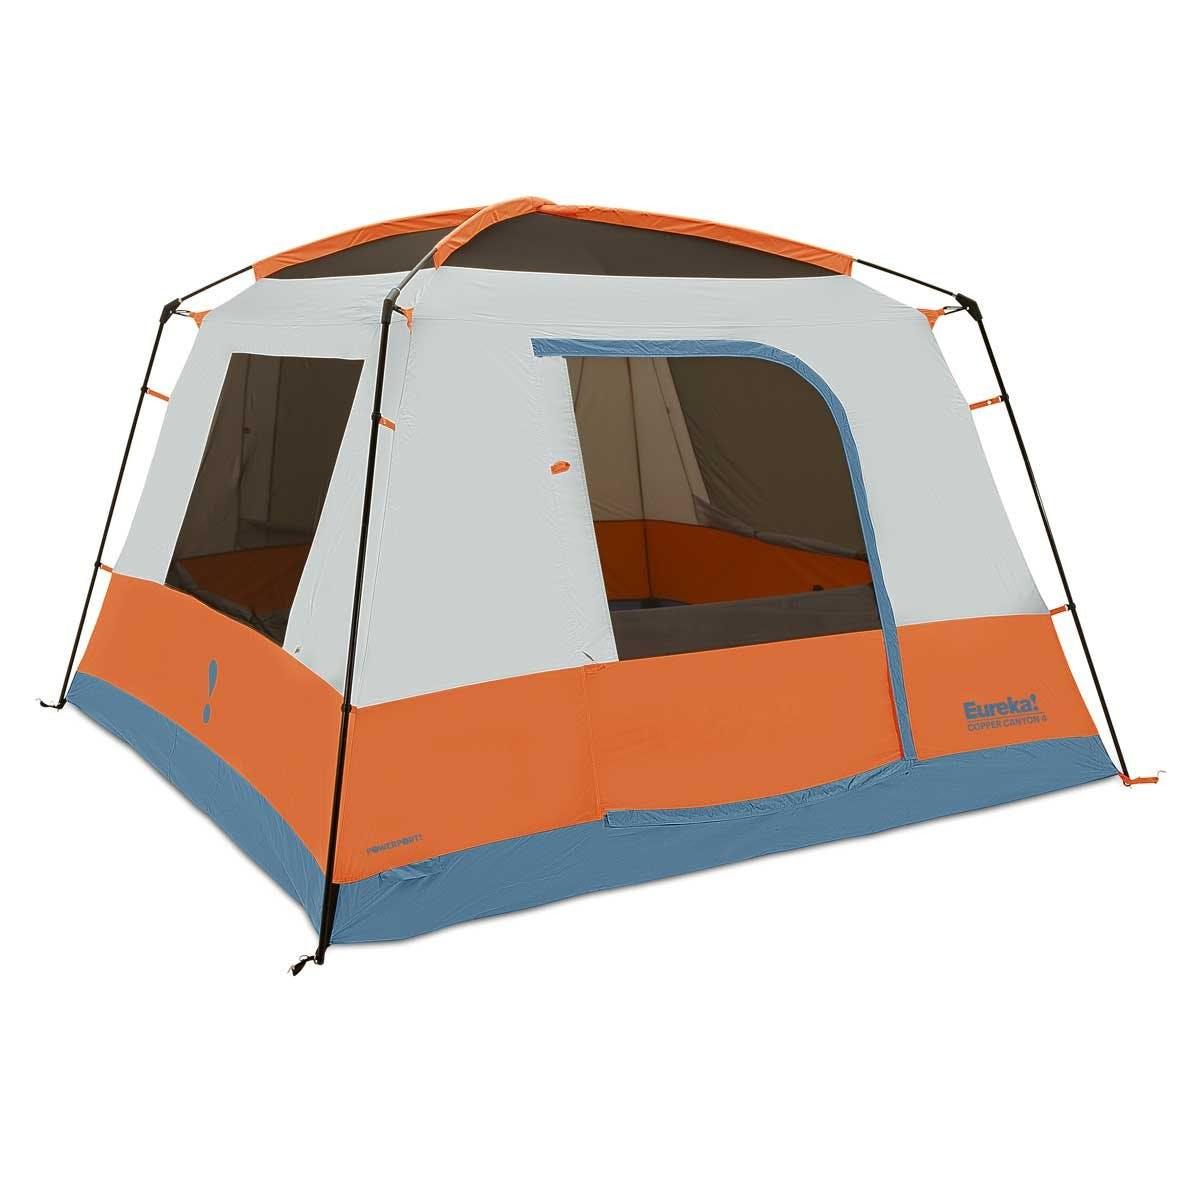 Eureka Copper Canyon LX 4 Tent